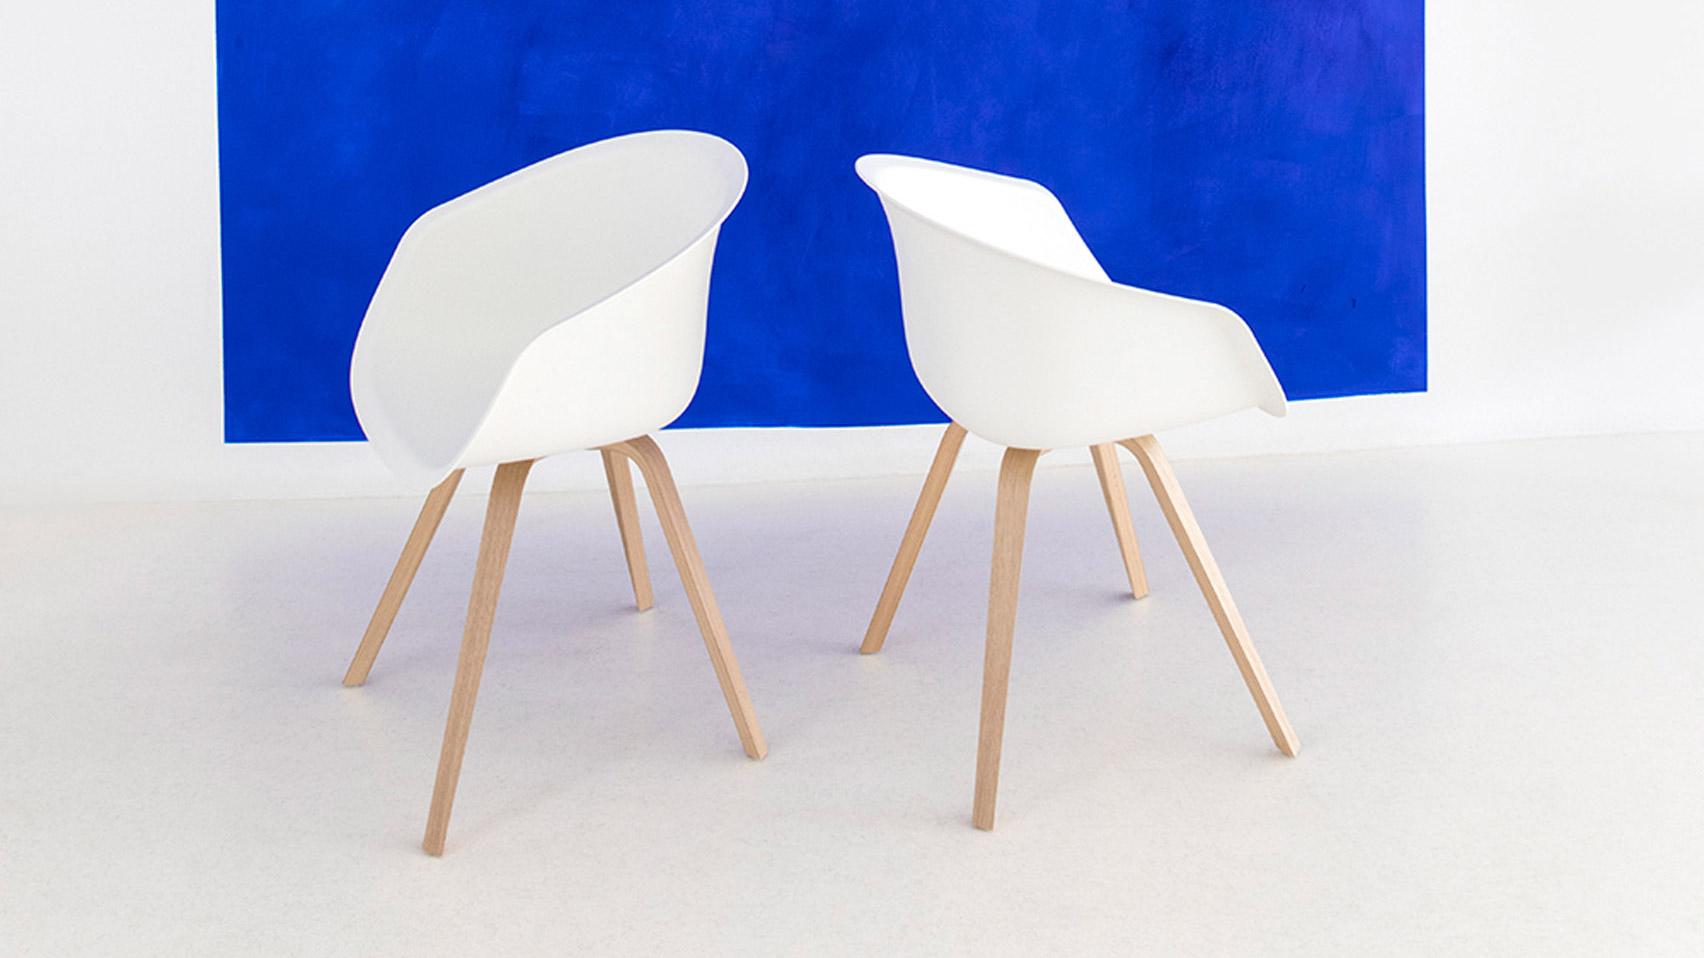 This Bucket Chair by Richard Hutten for Lensvelt